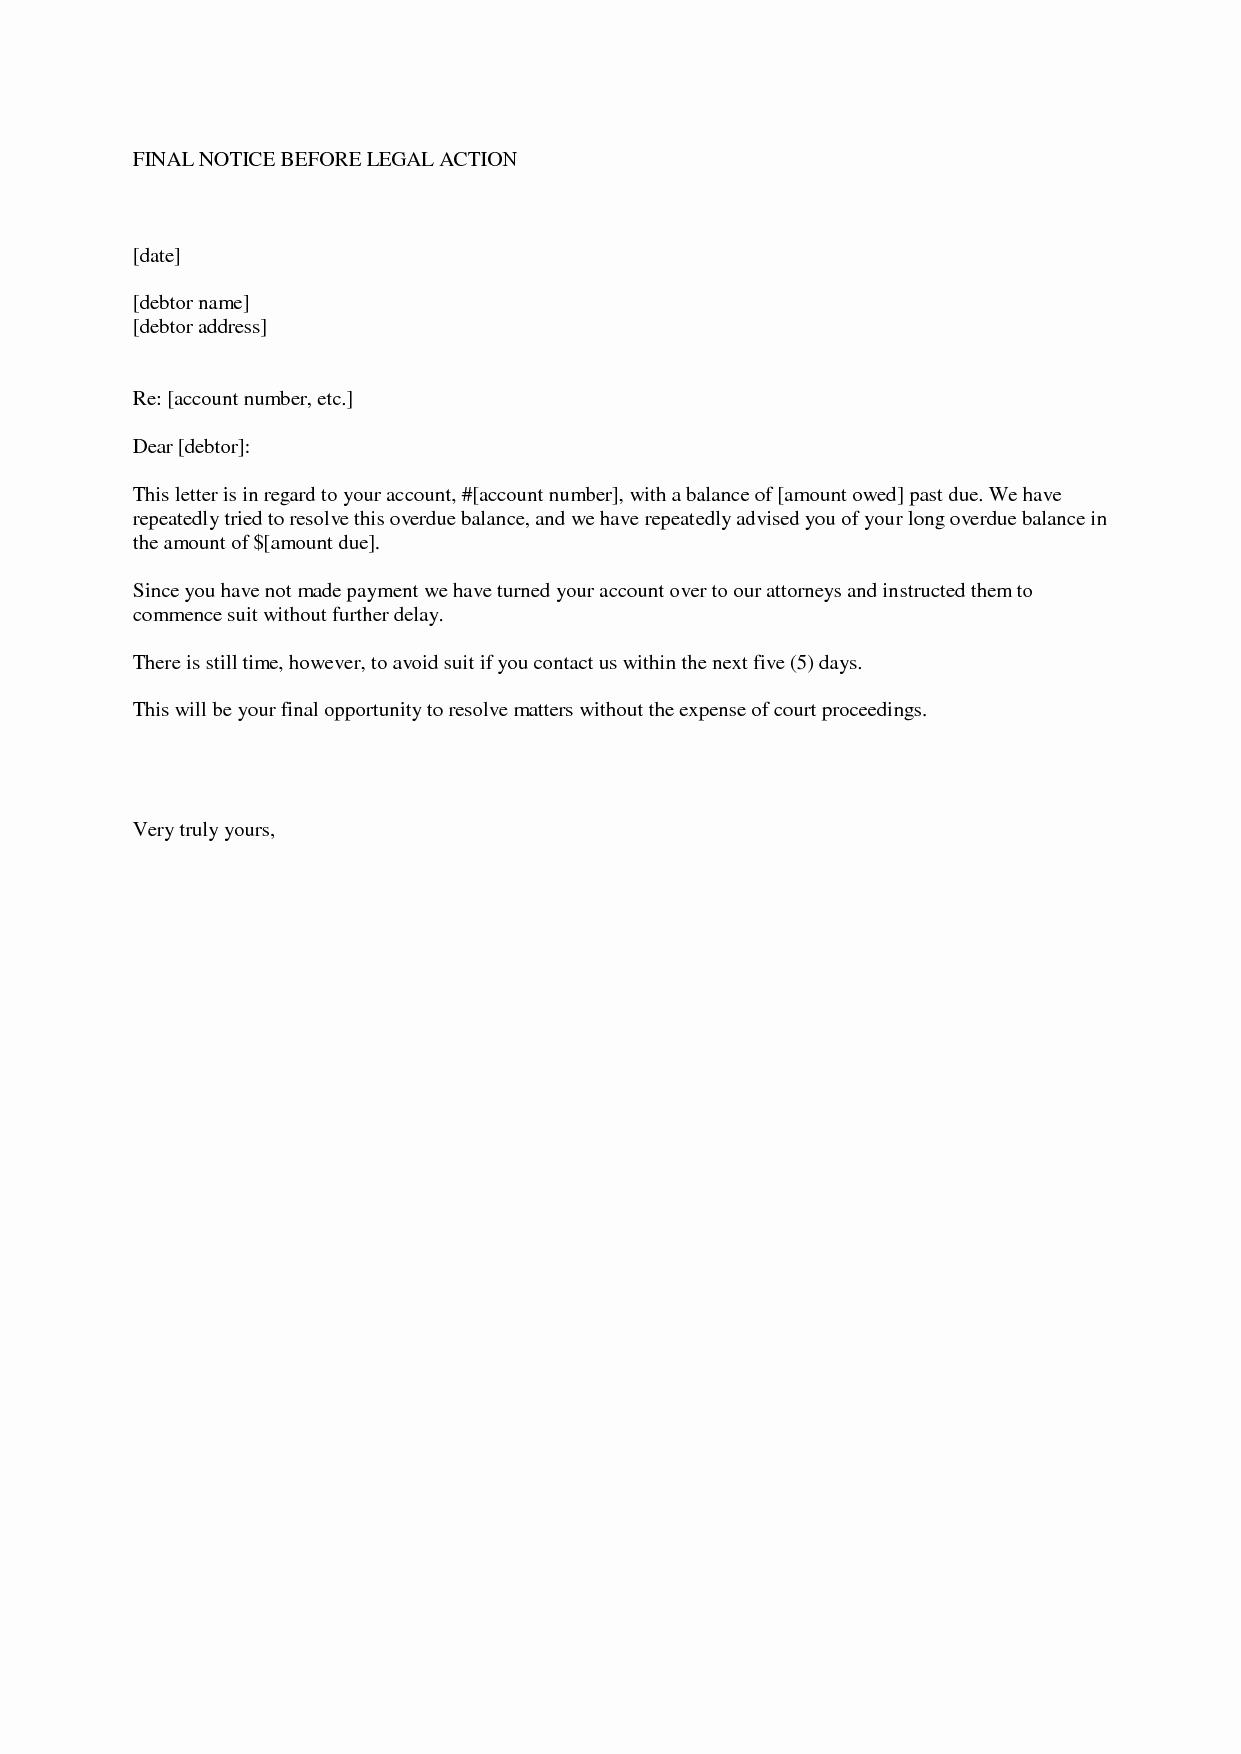 Collection Letter Final Notice Elegant Best S Of Collection Letter before Legal Action